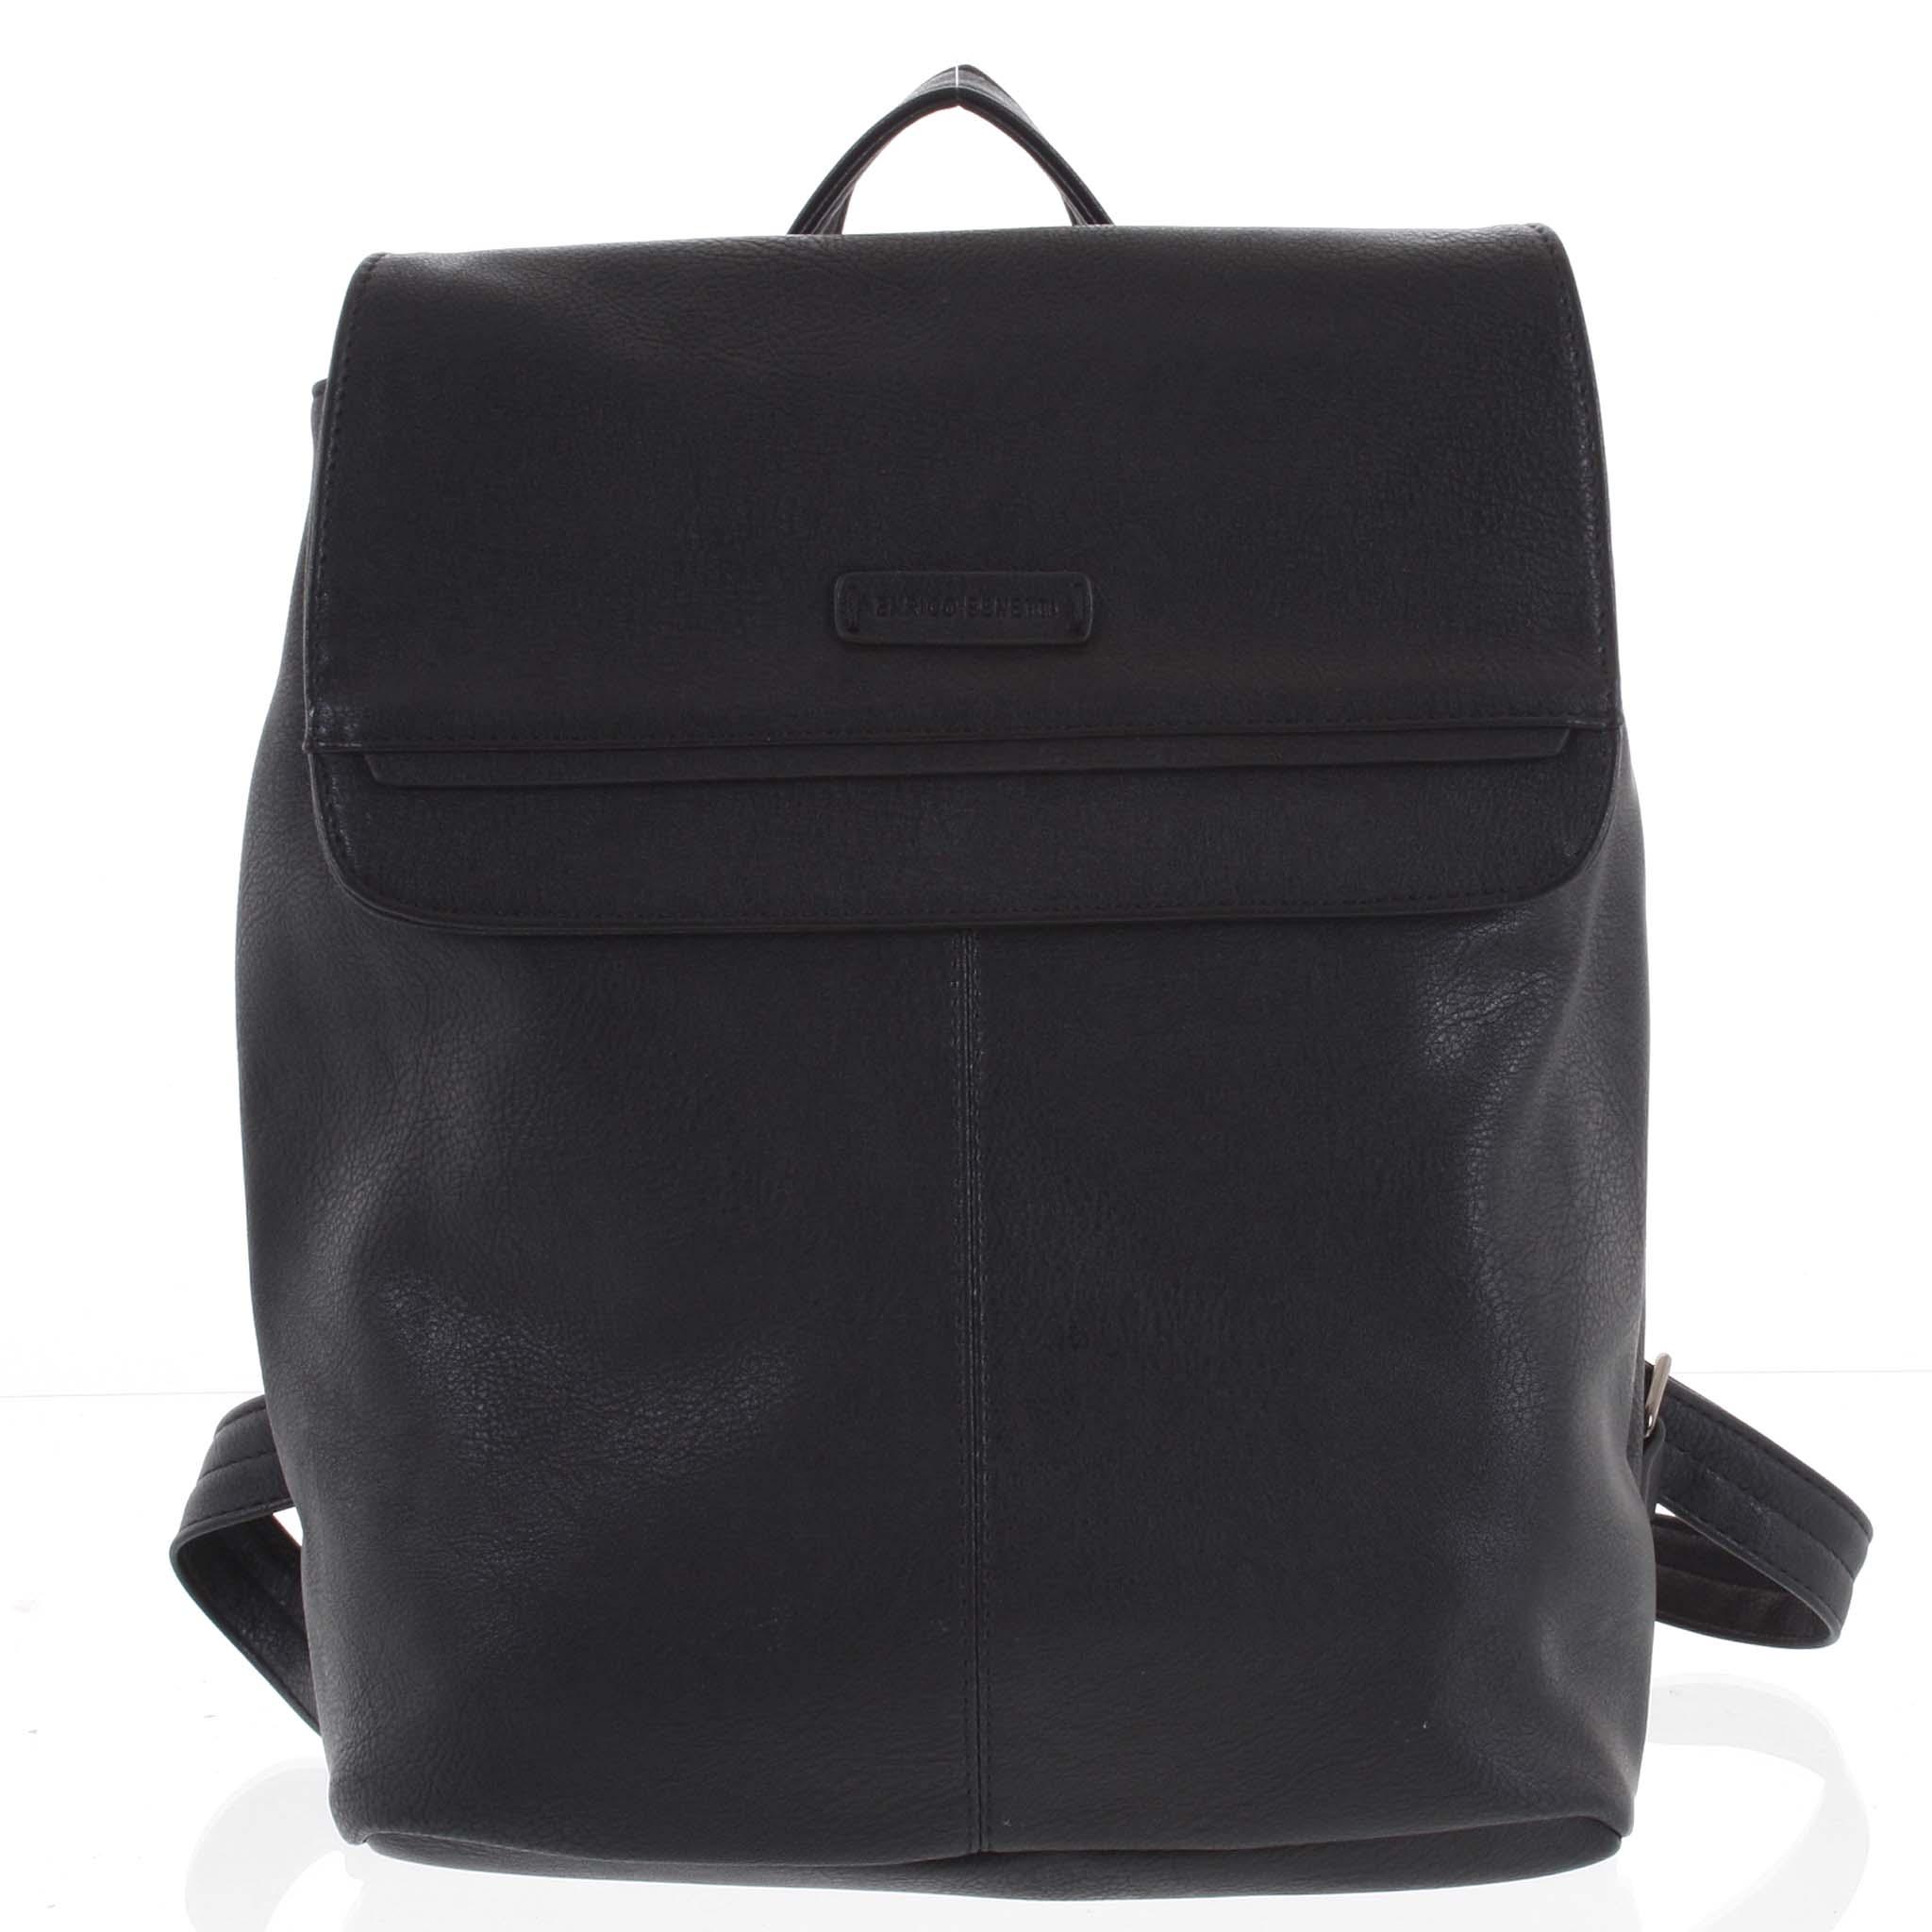 Dámský stylový batoh černý - Enrico Benetti Neneke